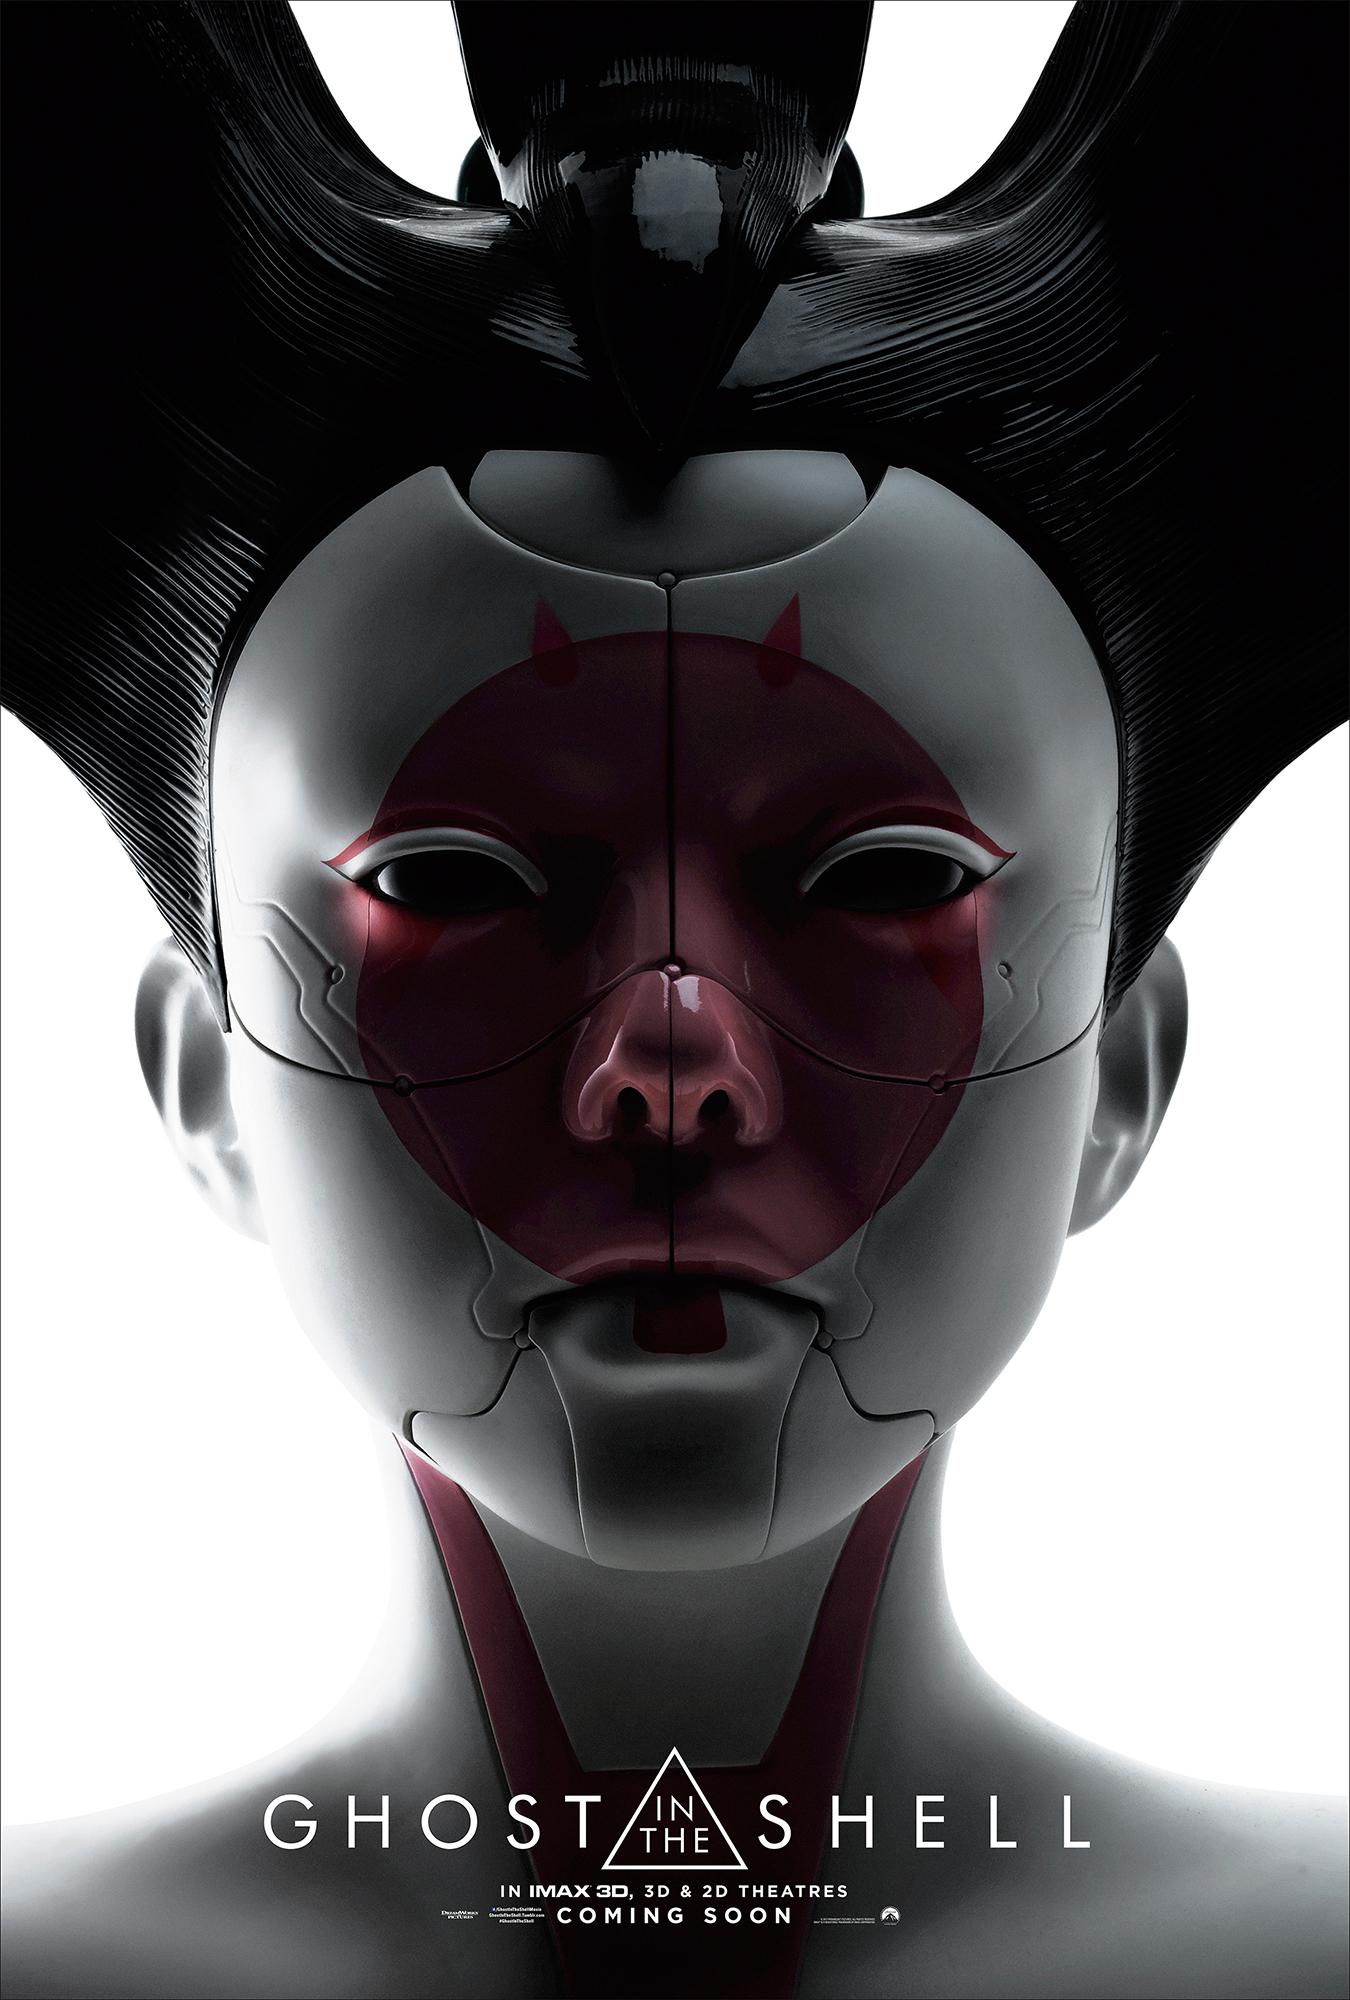 GITS_INTL_1Sht_Geisha_100dpi.jpg